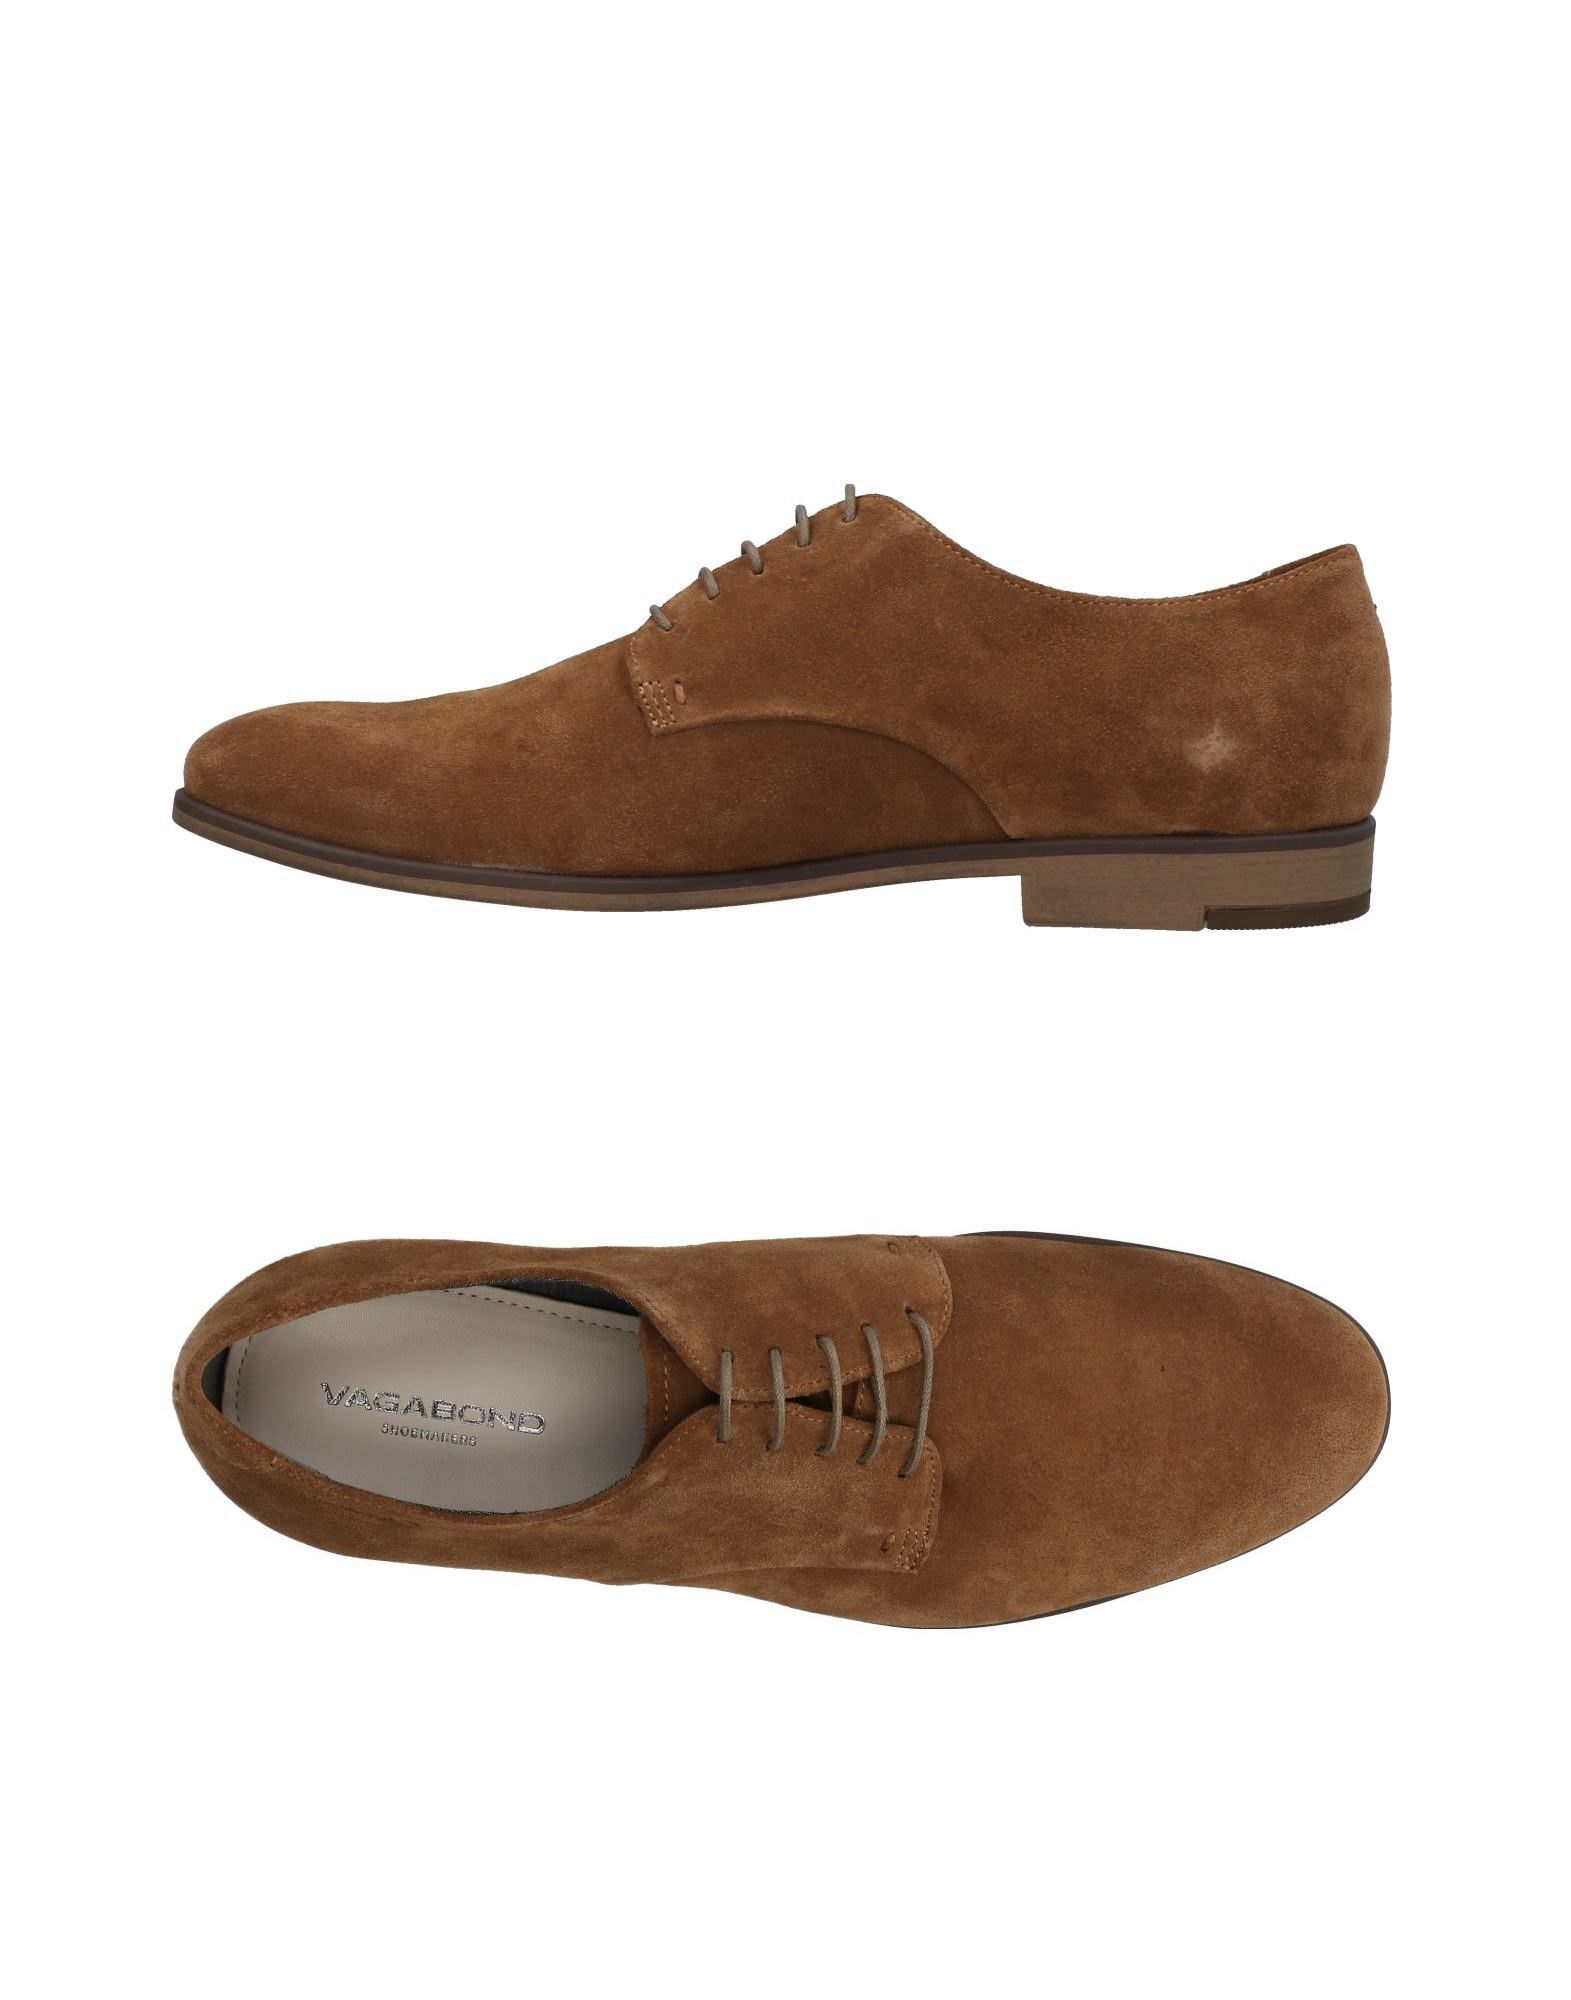 Stringate 11448350XF Vagabond Shoemakers Uomo - 11448350XF Stringate ea2fc2